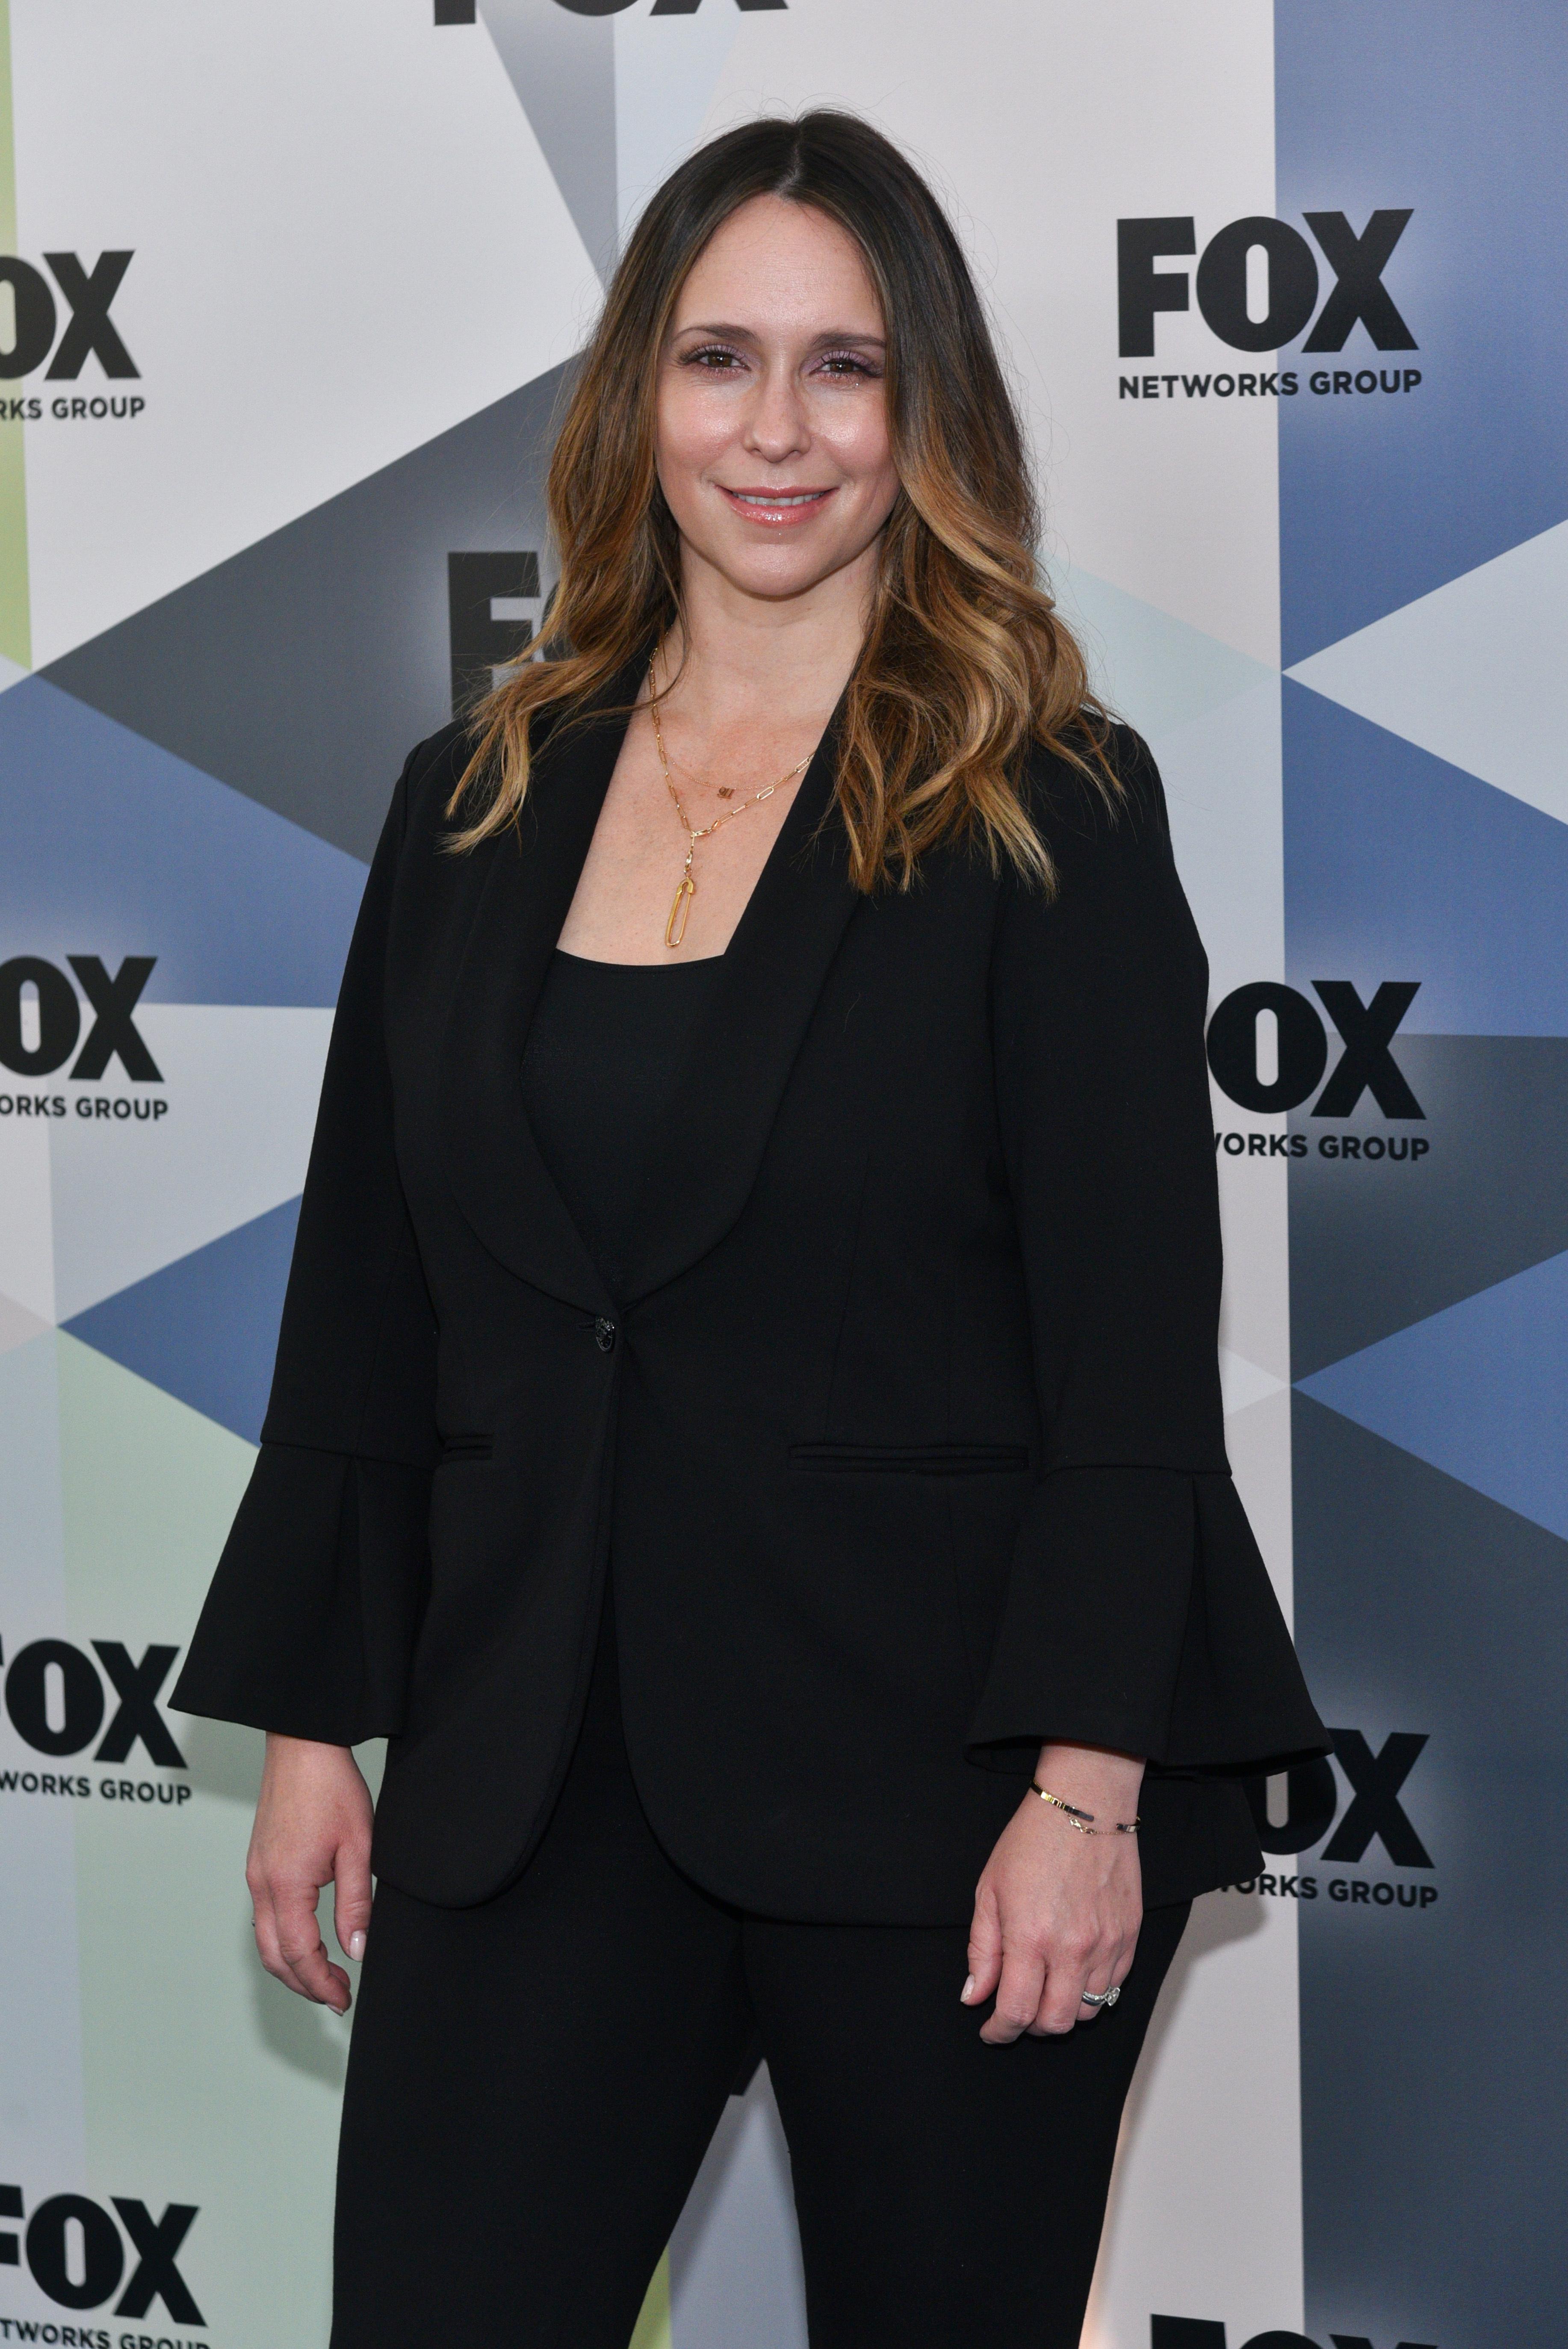 Jennifer Love Hewitt attends the Fox Upfront Presentation in New York City on May 14, 2018.